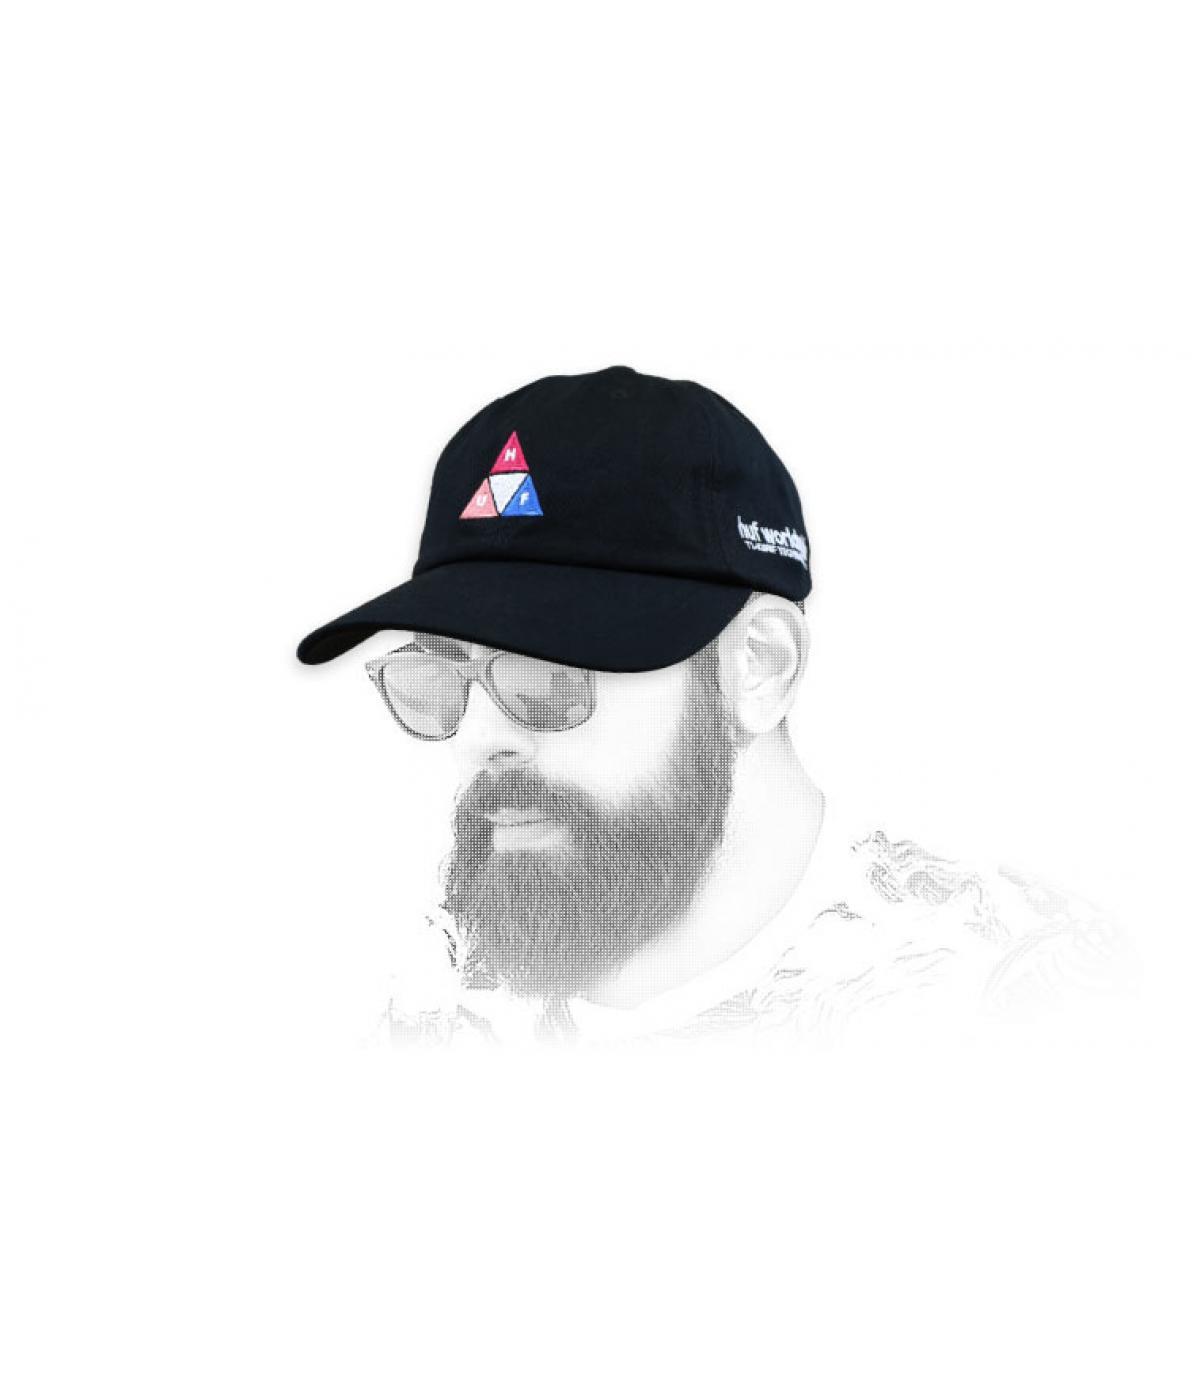 Huf cap triangle logo black